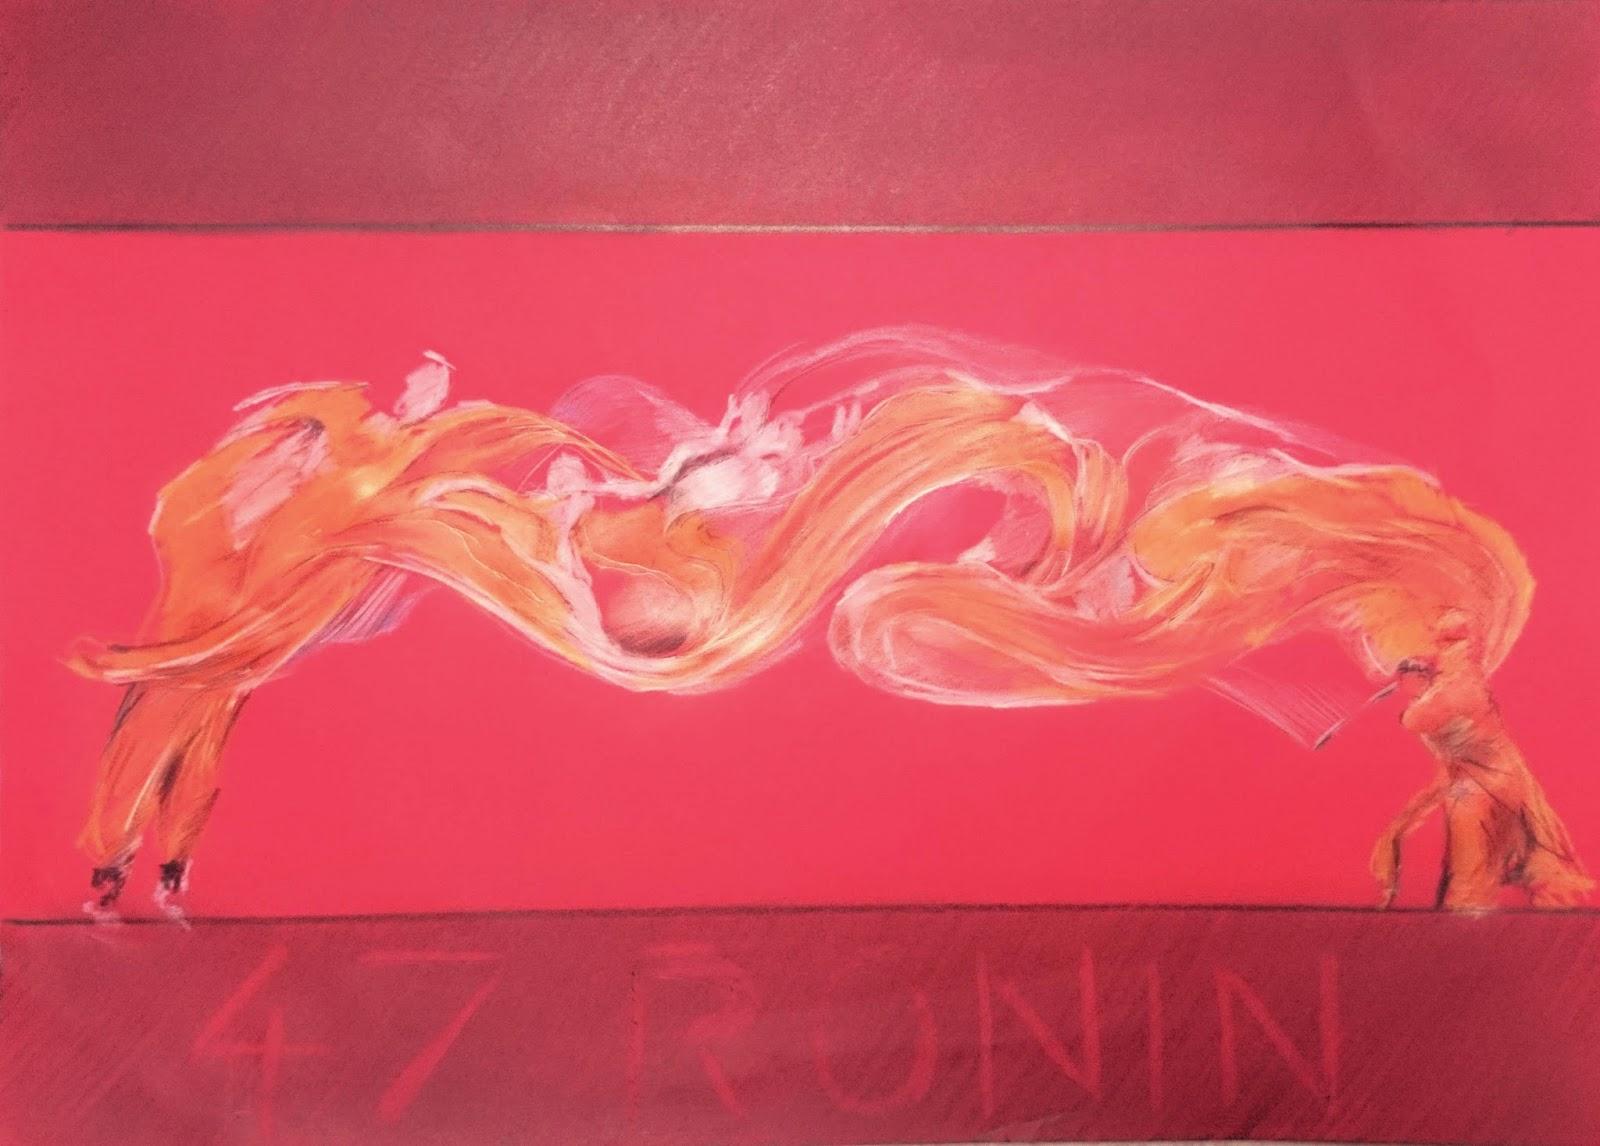 47 Ronin Artwork - Tengo Fight